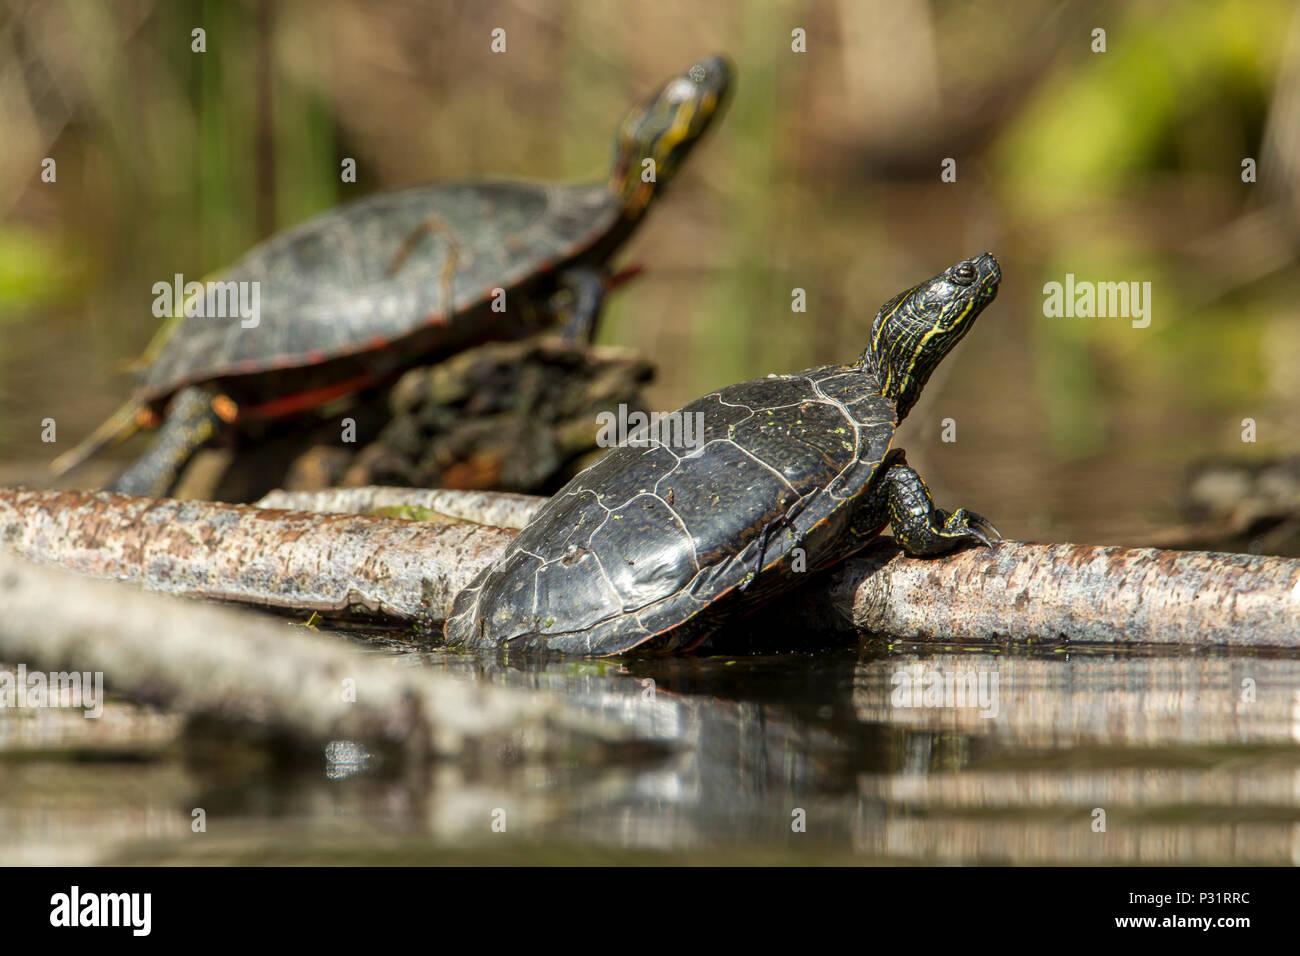 América dos tortugas pintada (Chrysemys picta) tome el sol en un registro sobre Fernan Lake en Idaho. Imagen De Stock